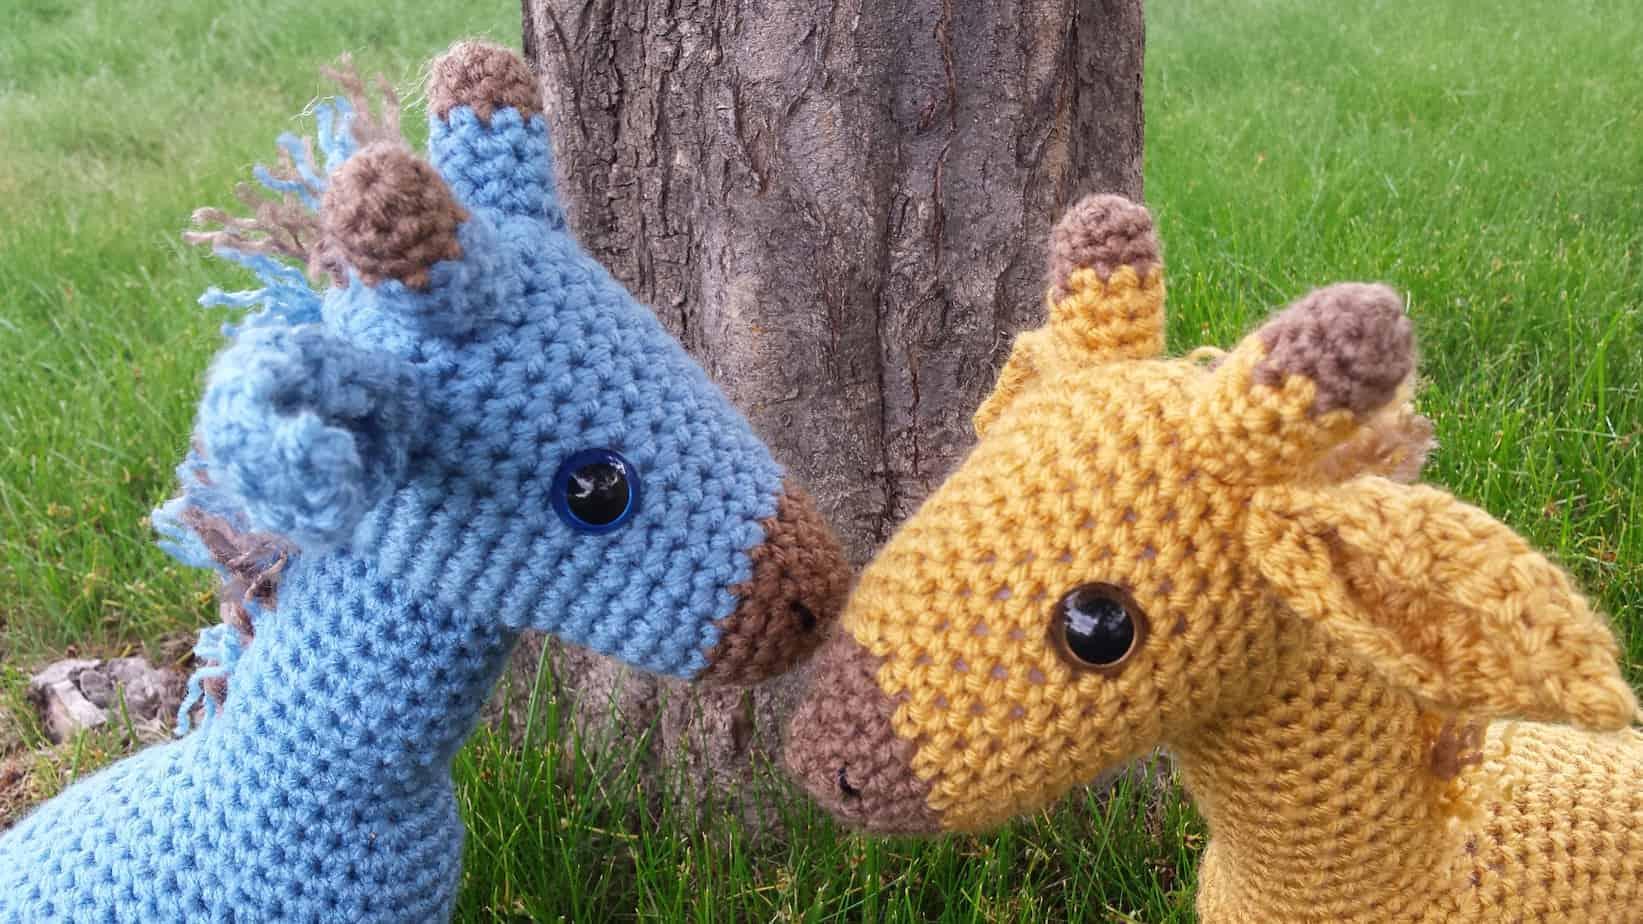 Awesome Hearty Giraffe 💗🎉 made by... - Amigurumi Today - Free amigurumi  patterns | Facebook | 2322x4128